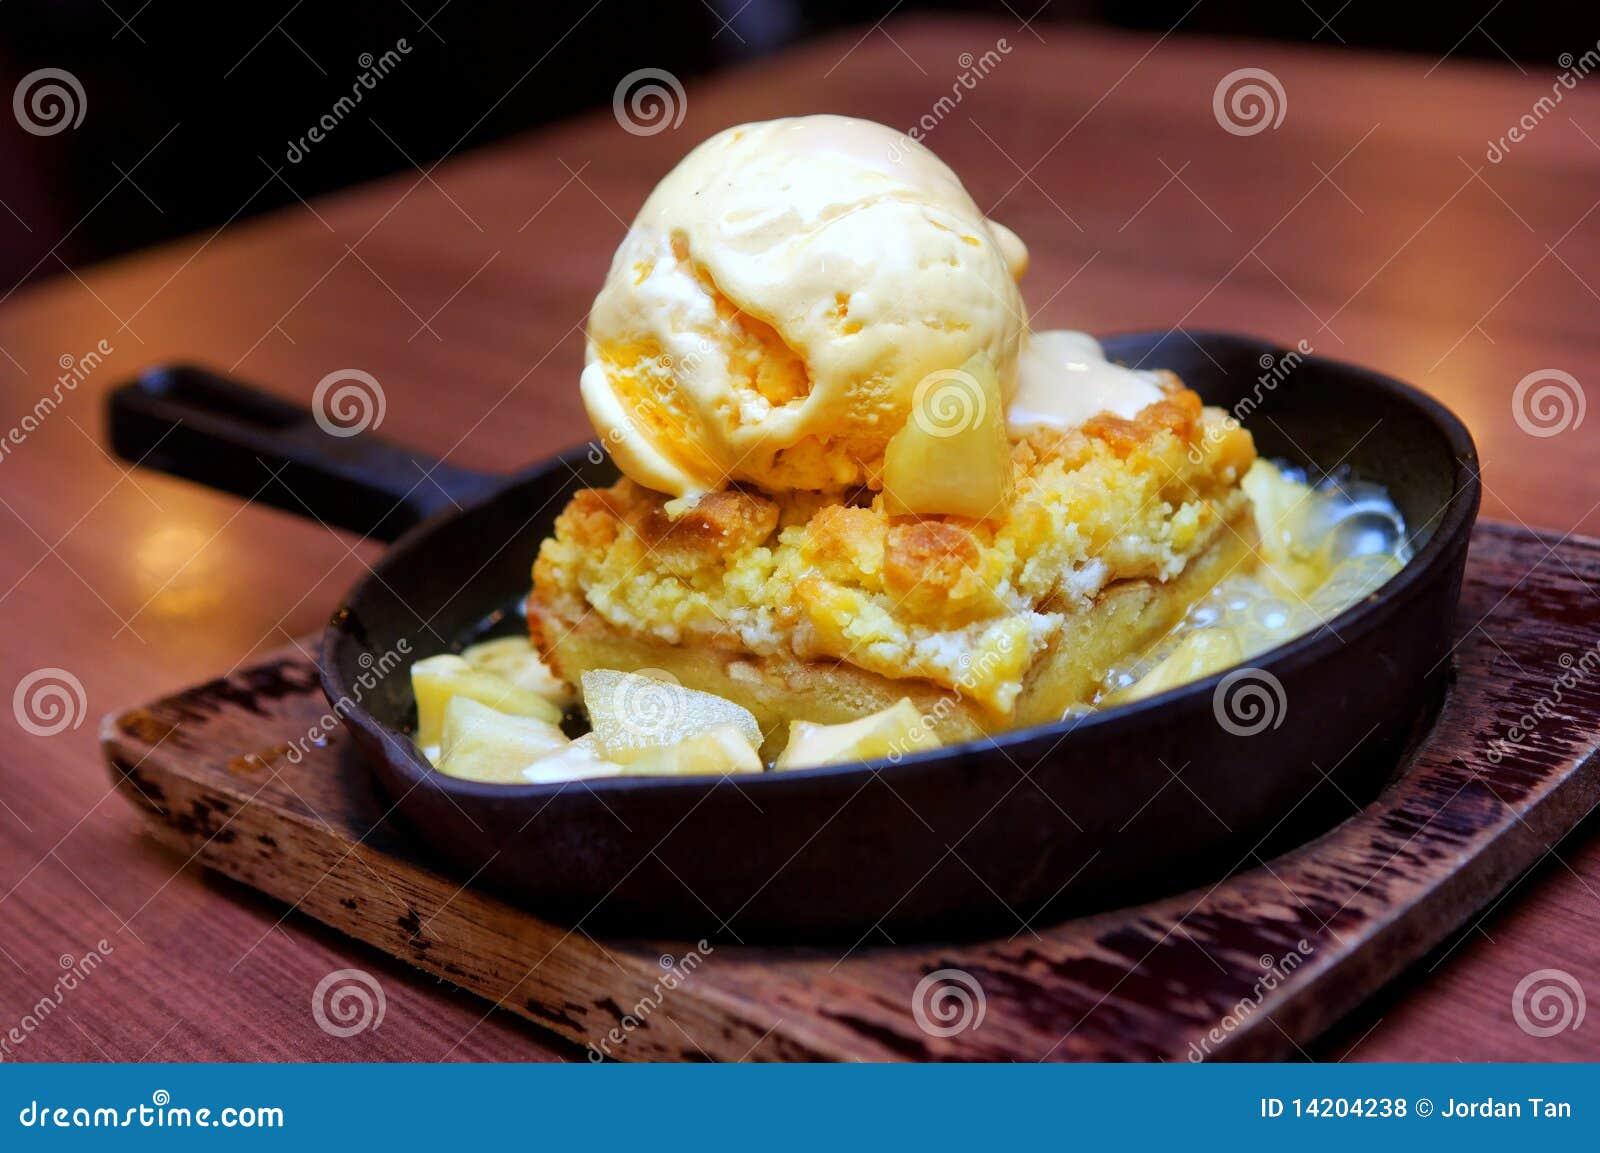 Vanilla Ice Cream With Apple Crumble Royalty Free Stock Photos - Image ...